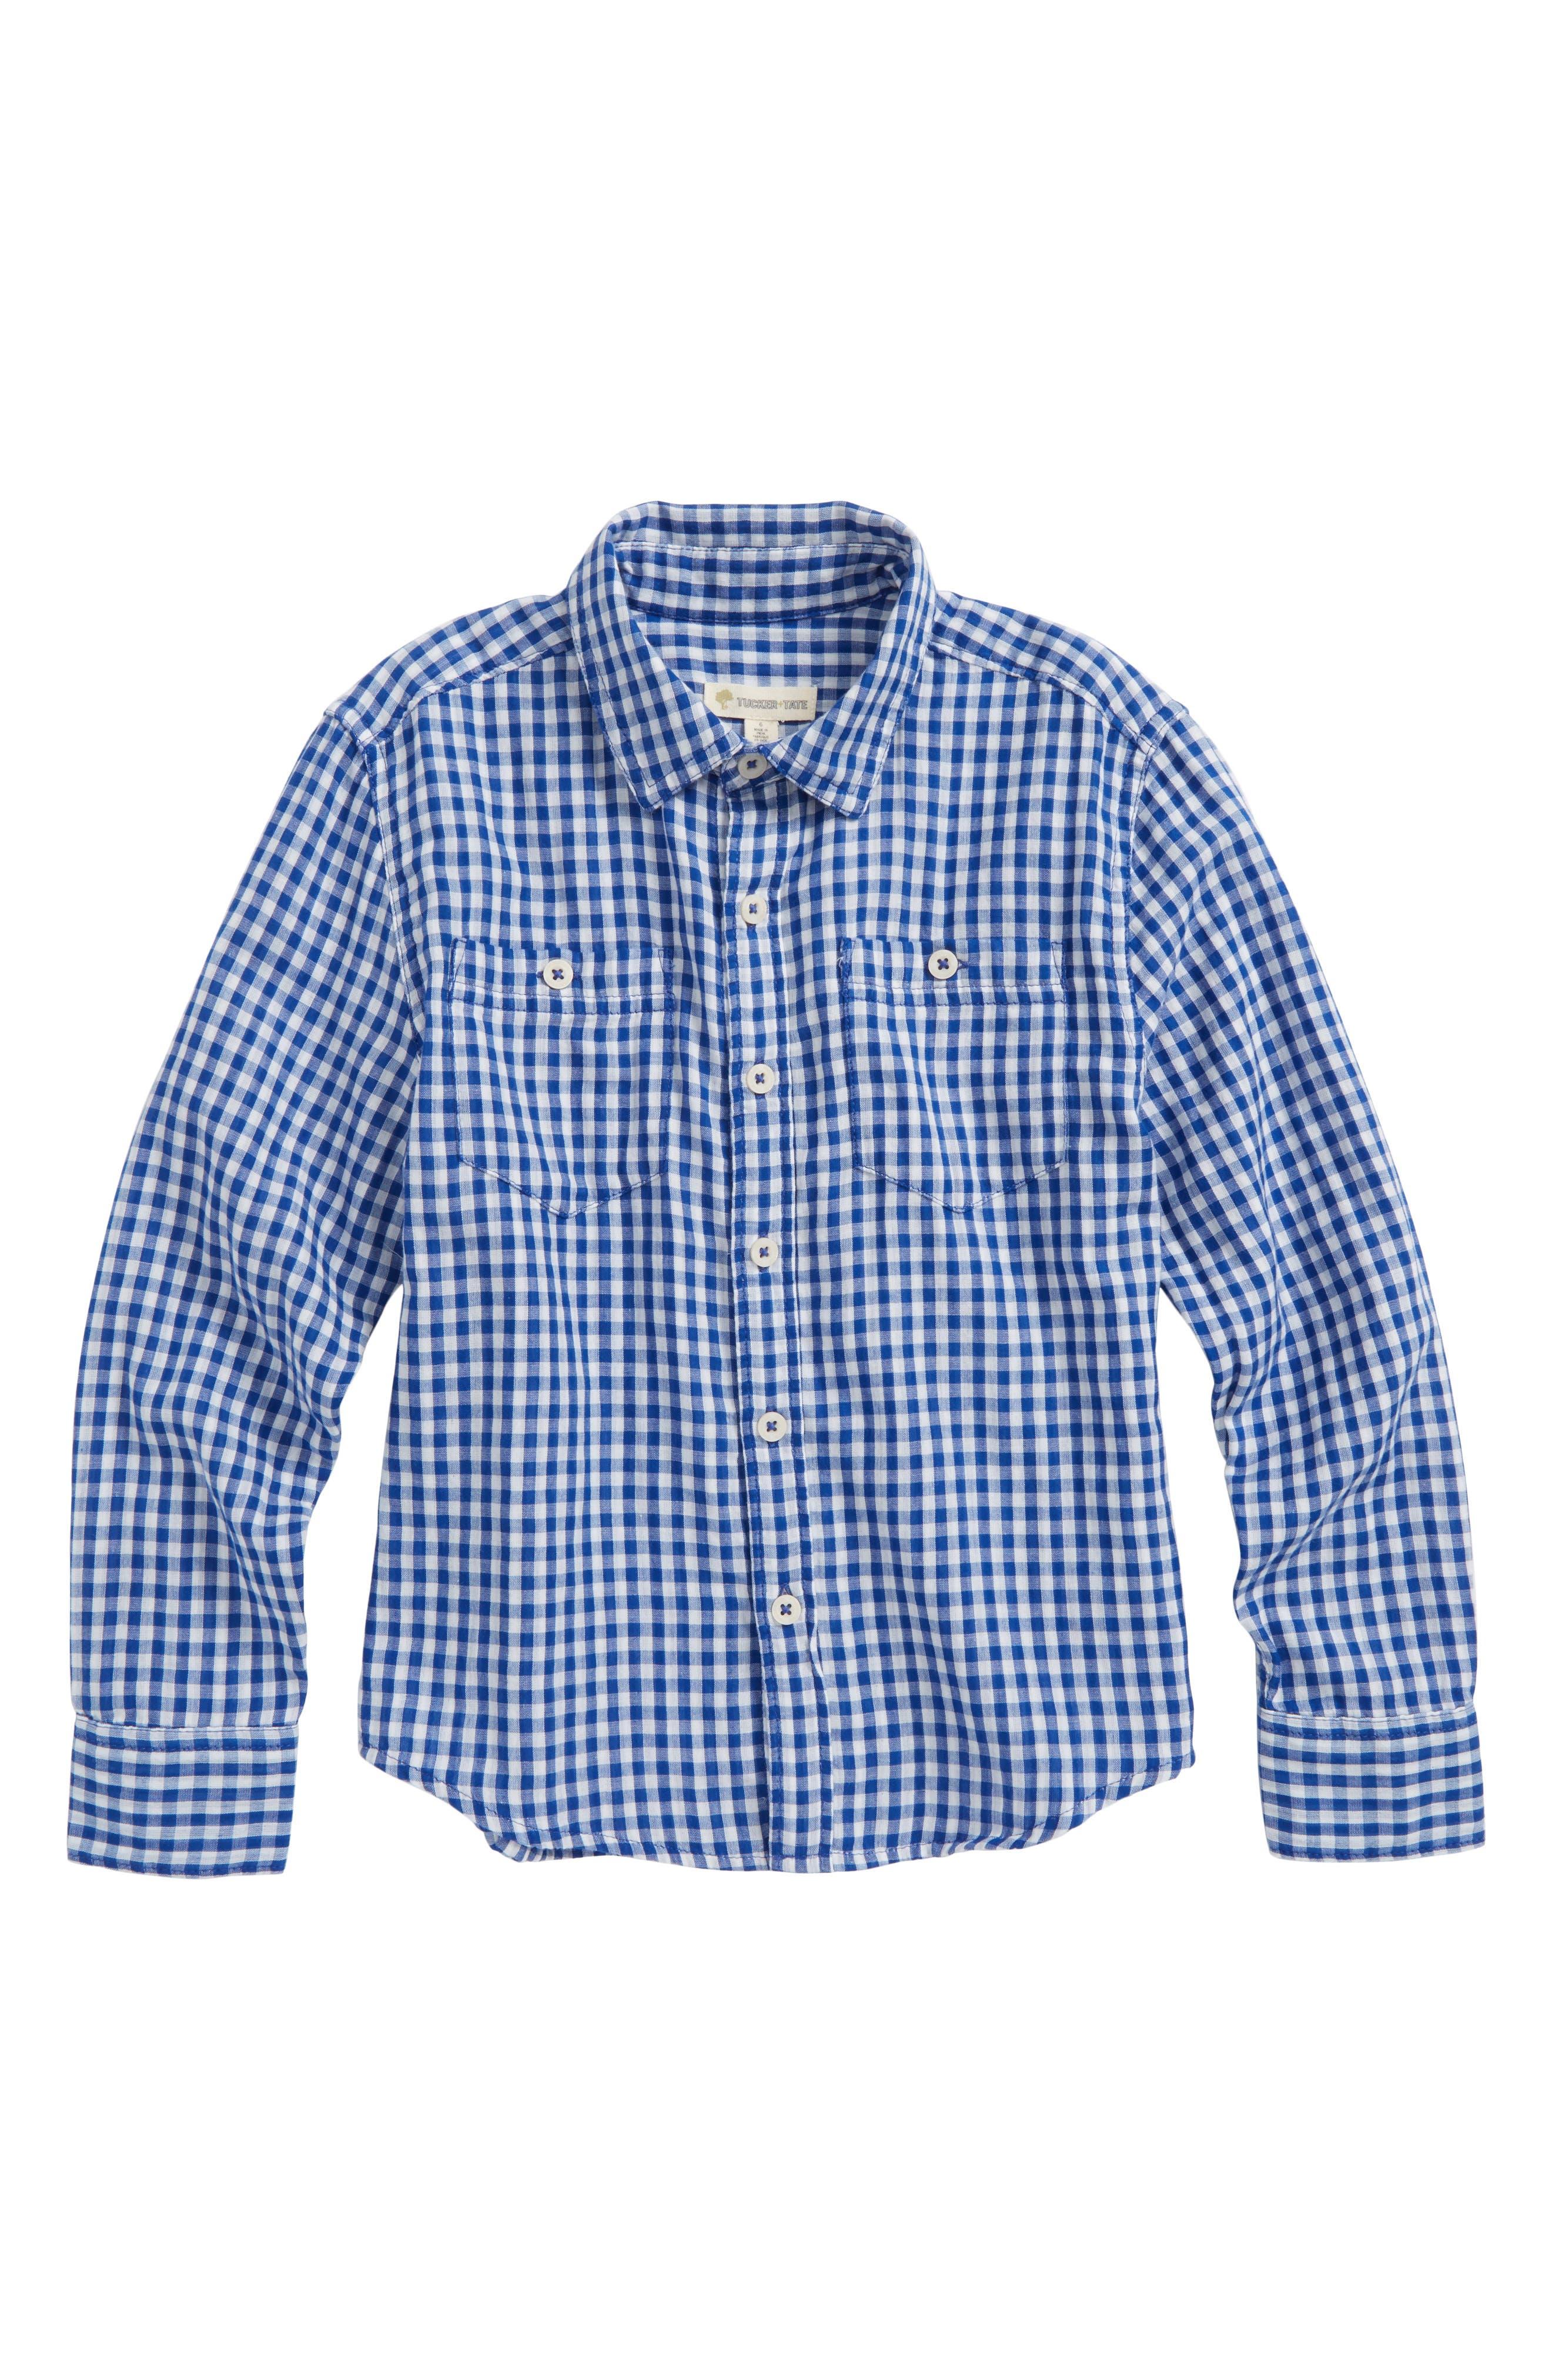 Double Cloth Shirt,                         Main,                         color, Blue Calm Gingham